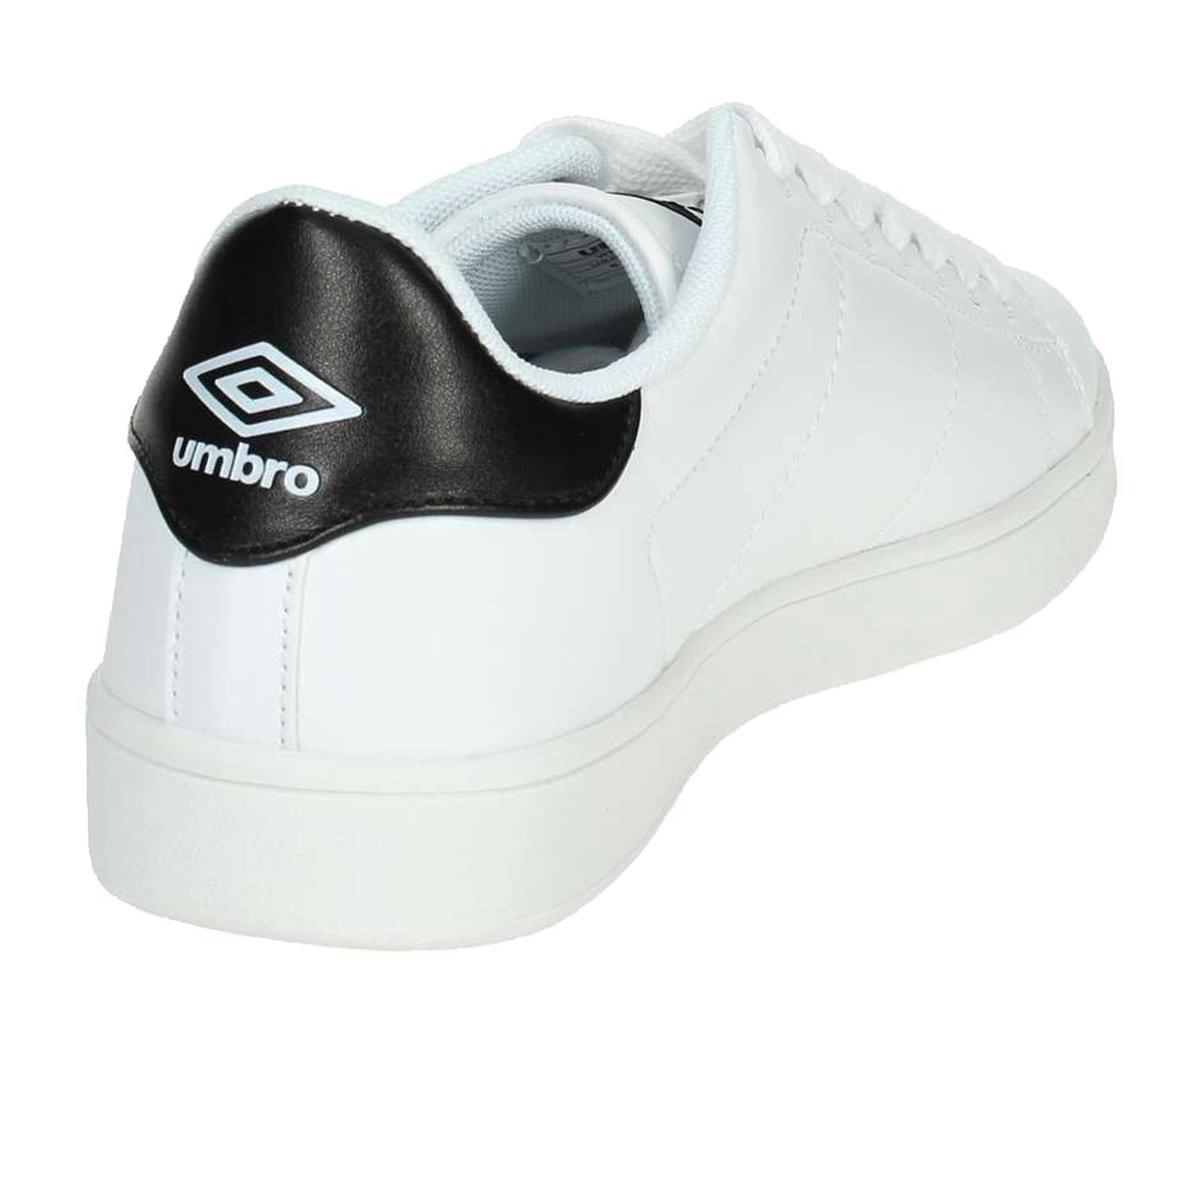 Scarpe Sneakers Umbro basse da uomo rif. RFP38002S WHB